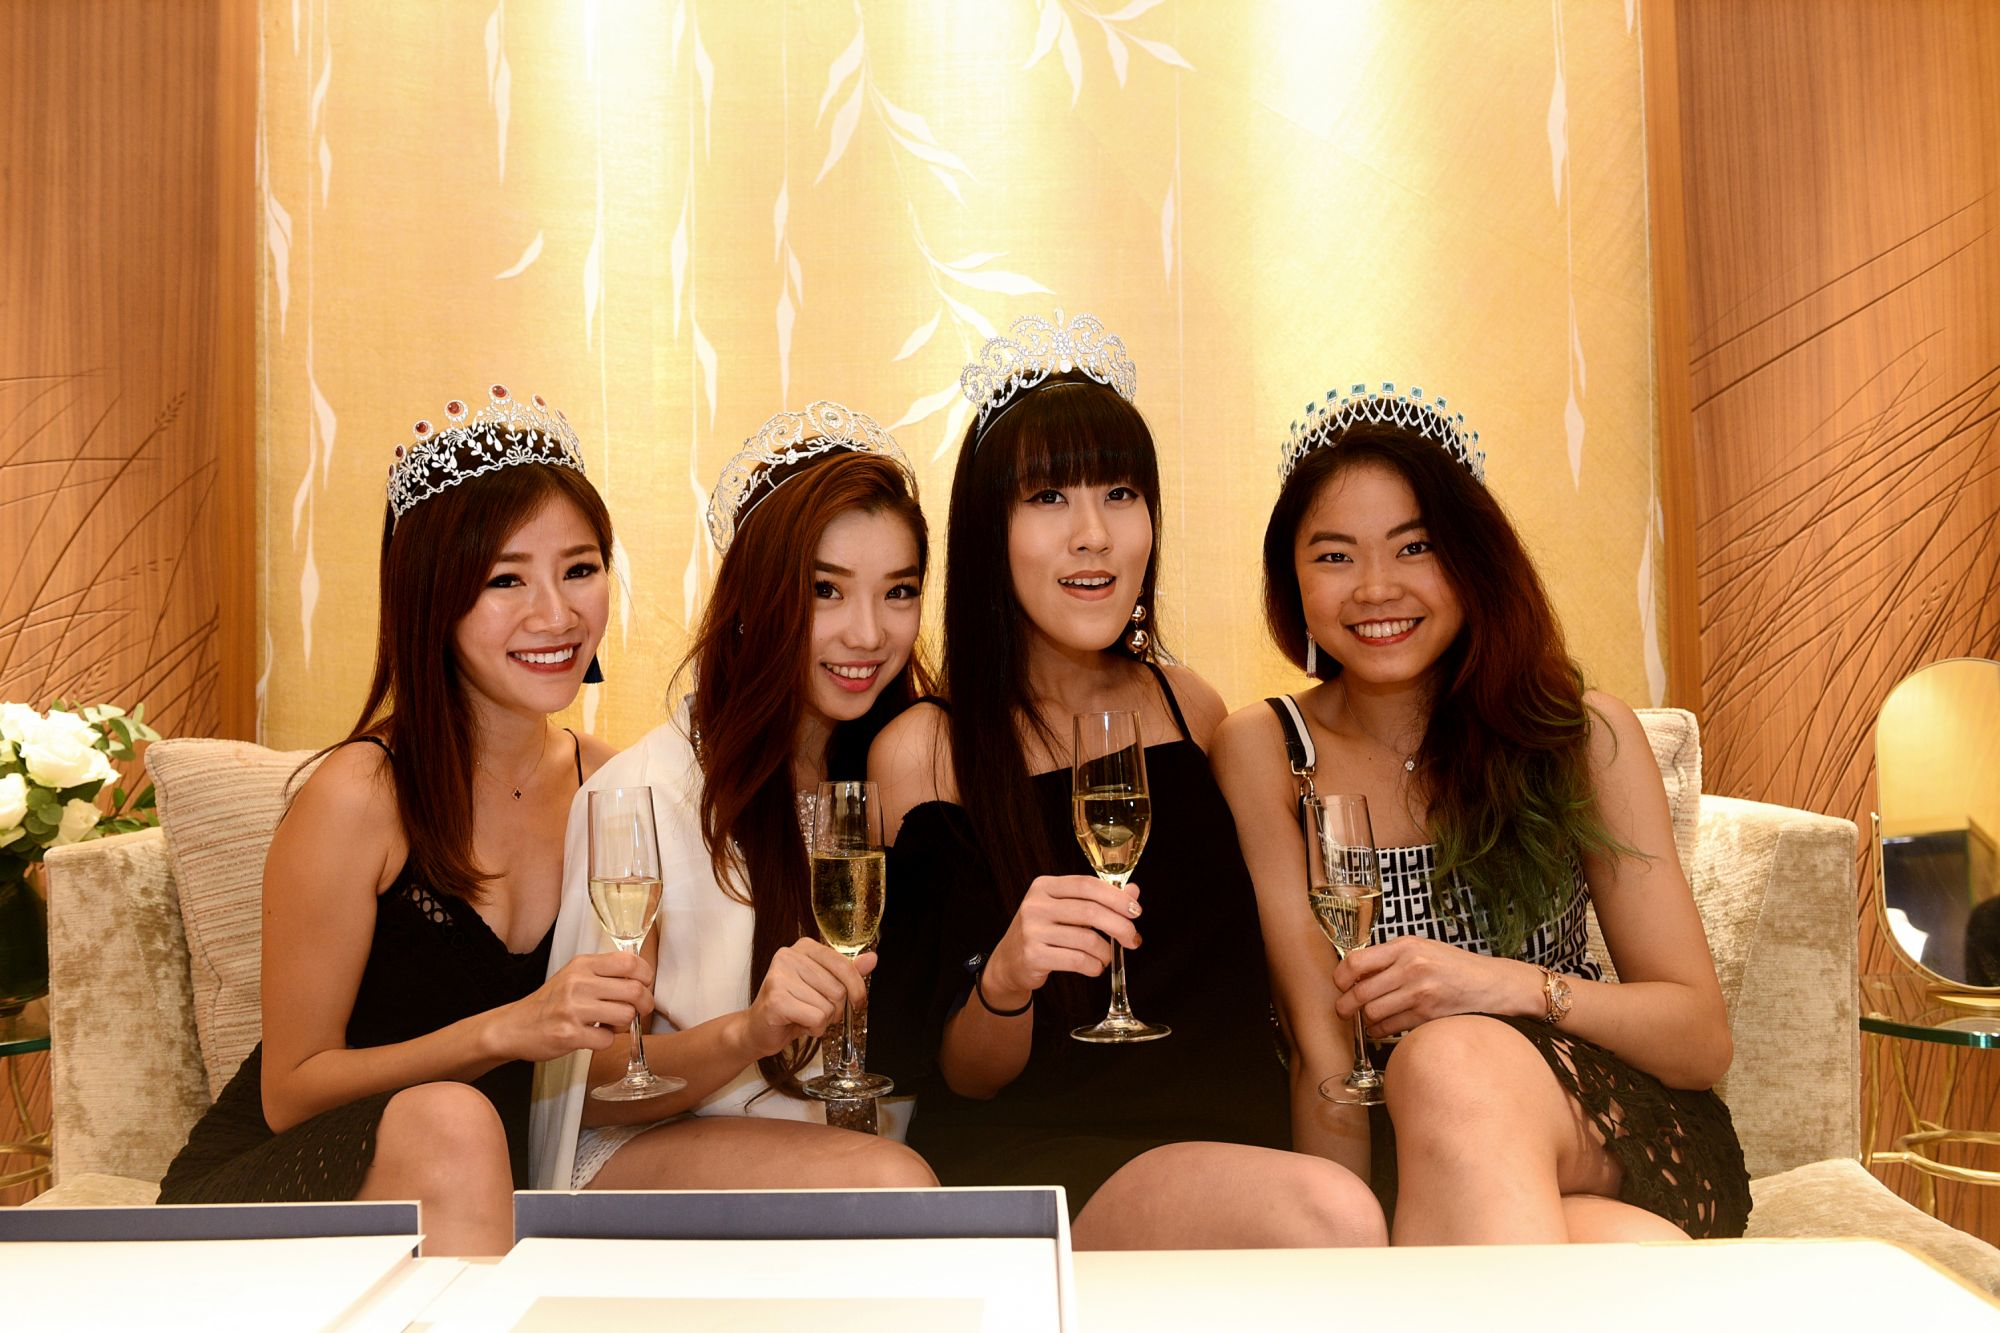 Samantha Tay, Liyann Seet, Qli Quek, Cheryl Cheong